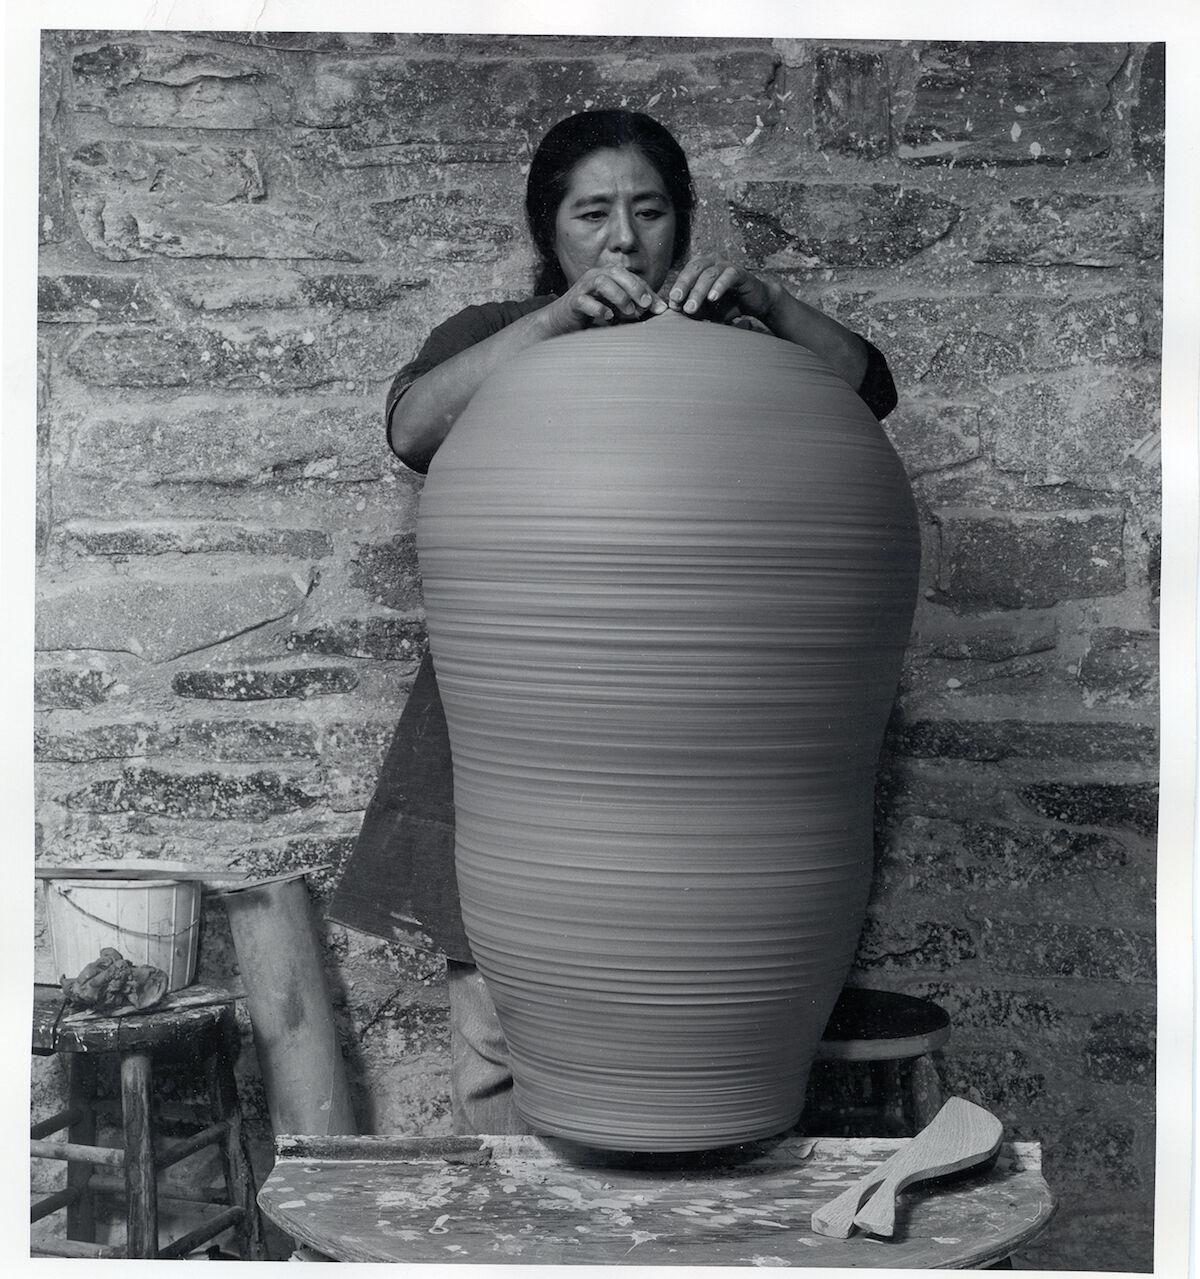 Toshiko Takaezu, 1974. Photographer unknown. Toshiko Takaezu papers. Courtesy Archives of American Art, Smithsonian Institution.